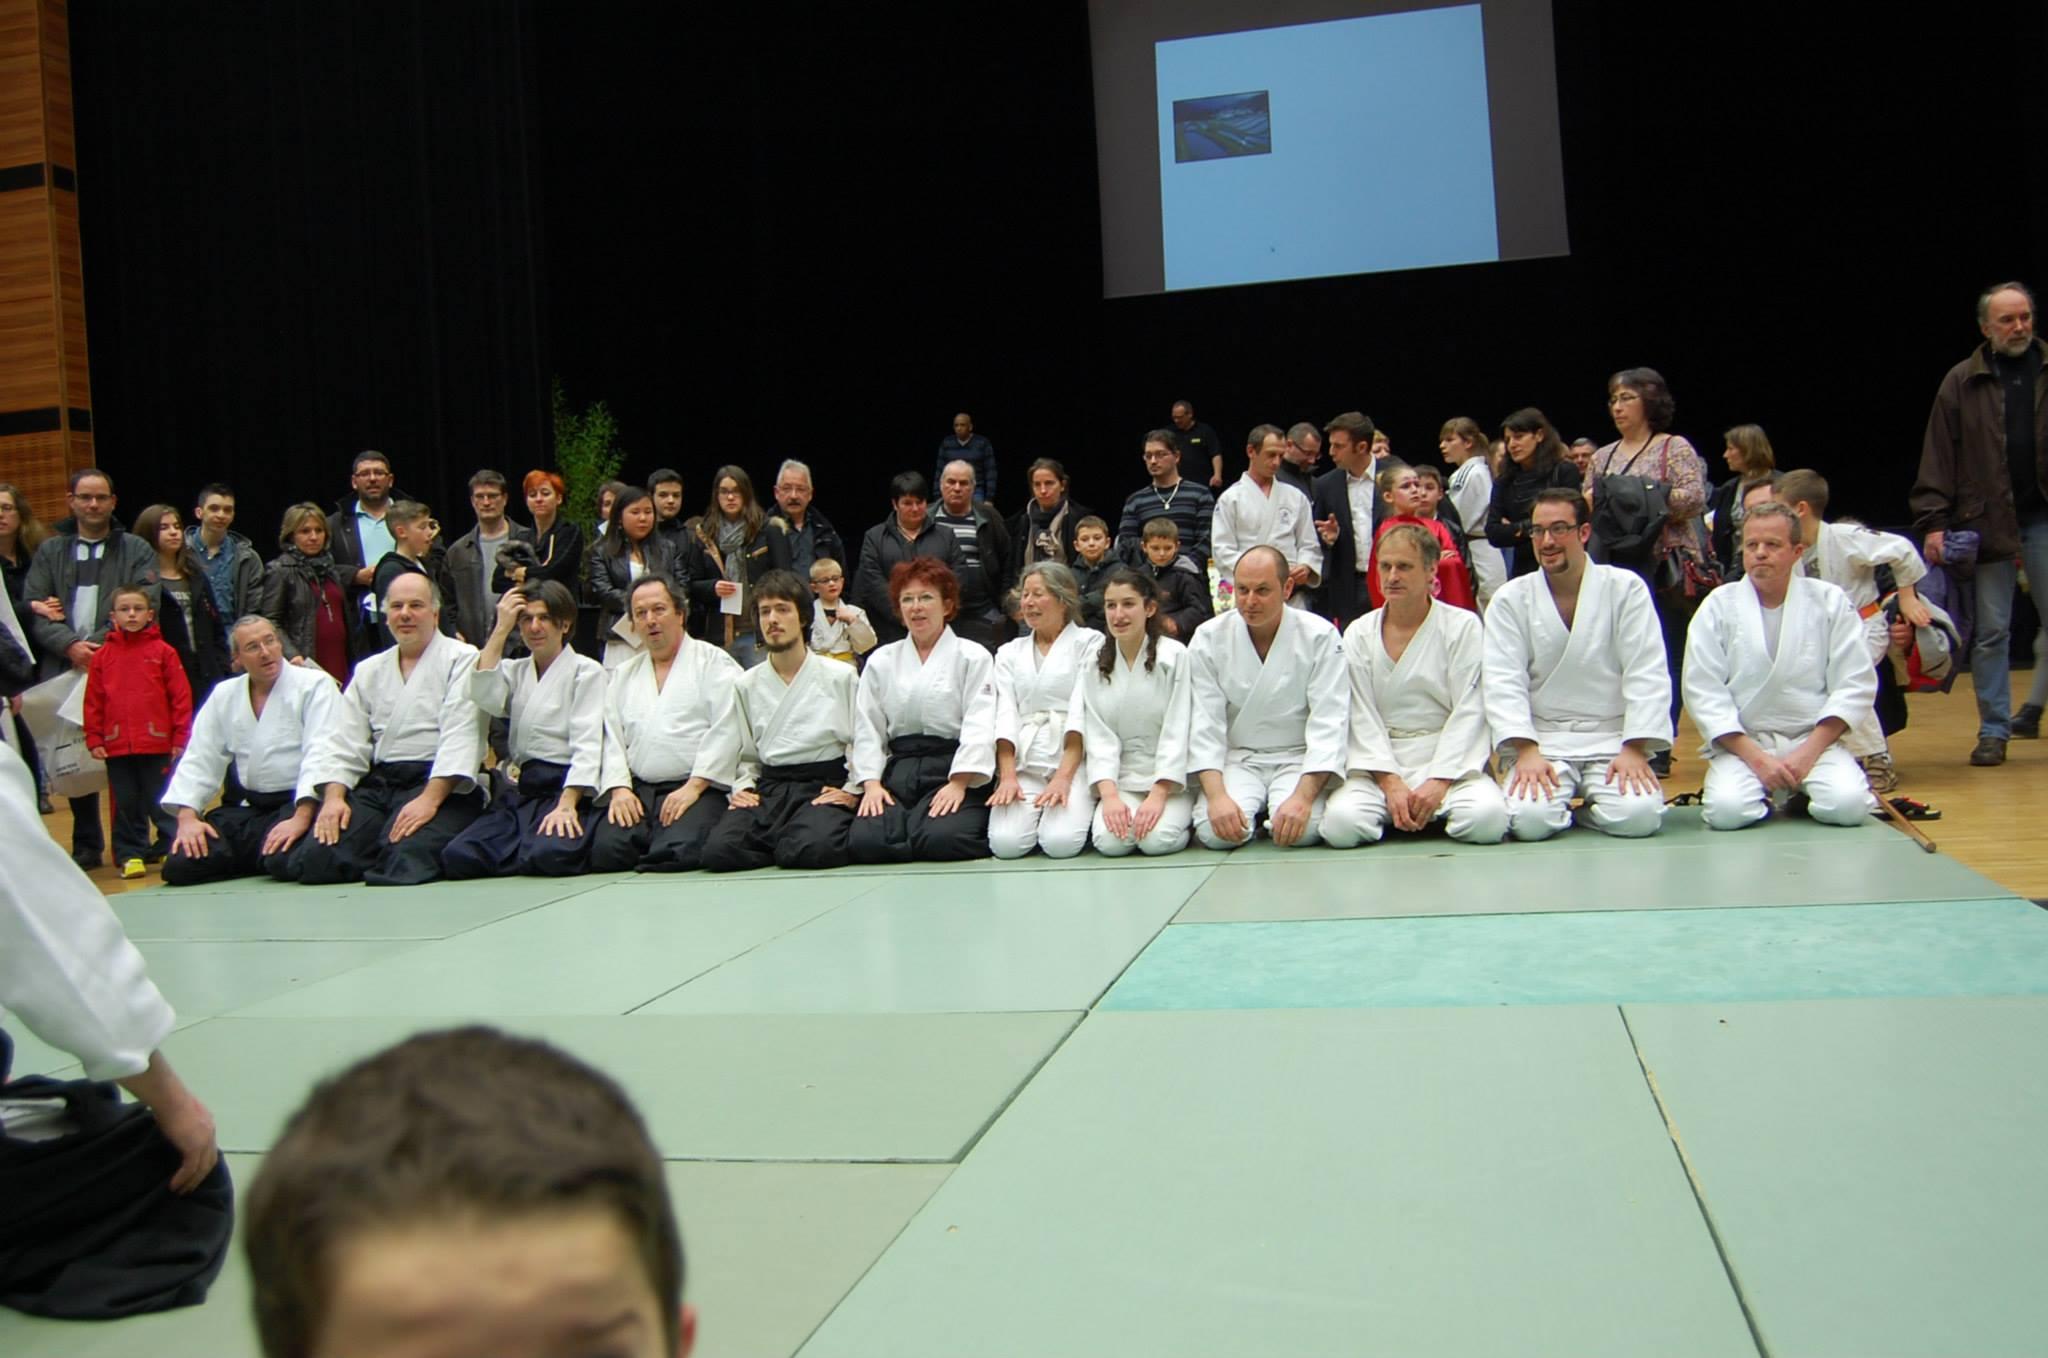 Démonstration d'Aïkido à l'Arsenal, le vendredi 3 mars 2014